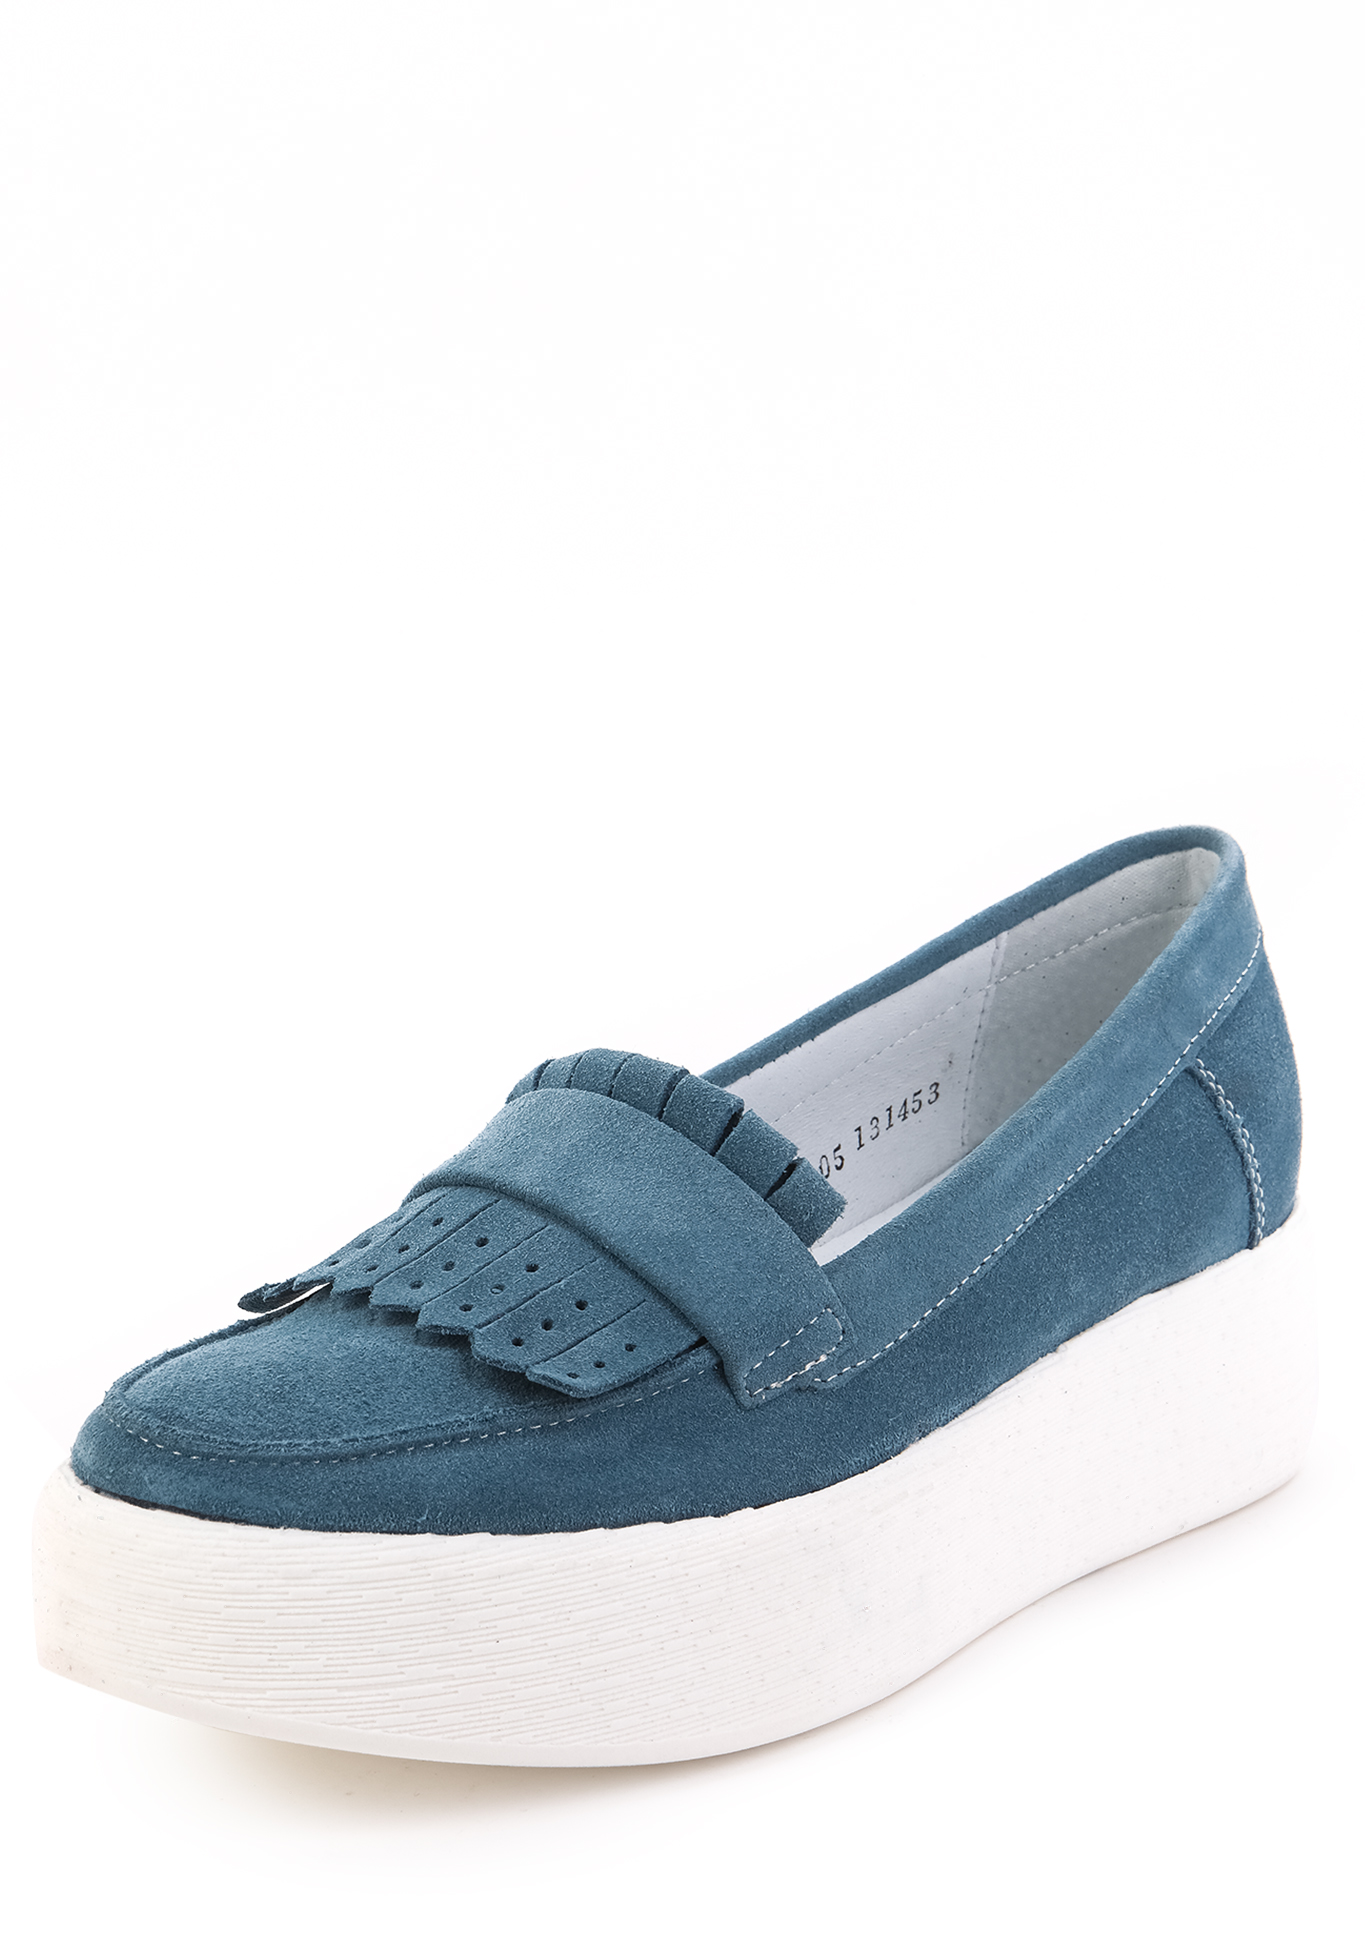 Туфли женские Фабиана